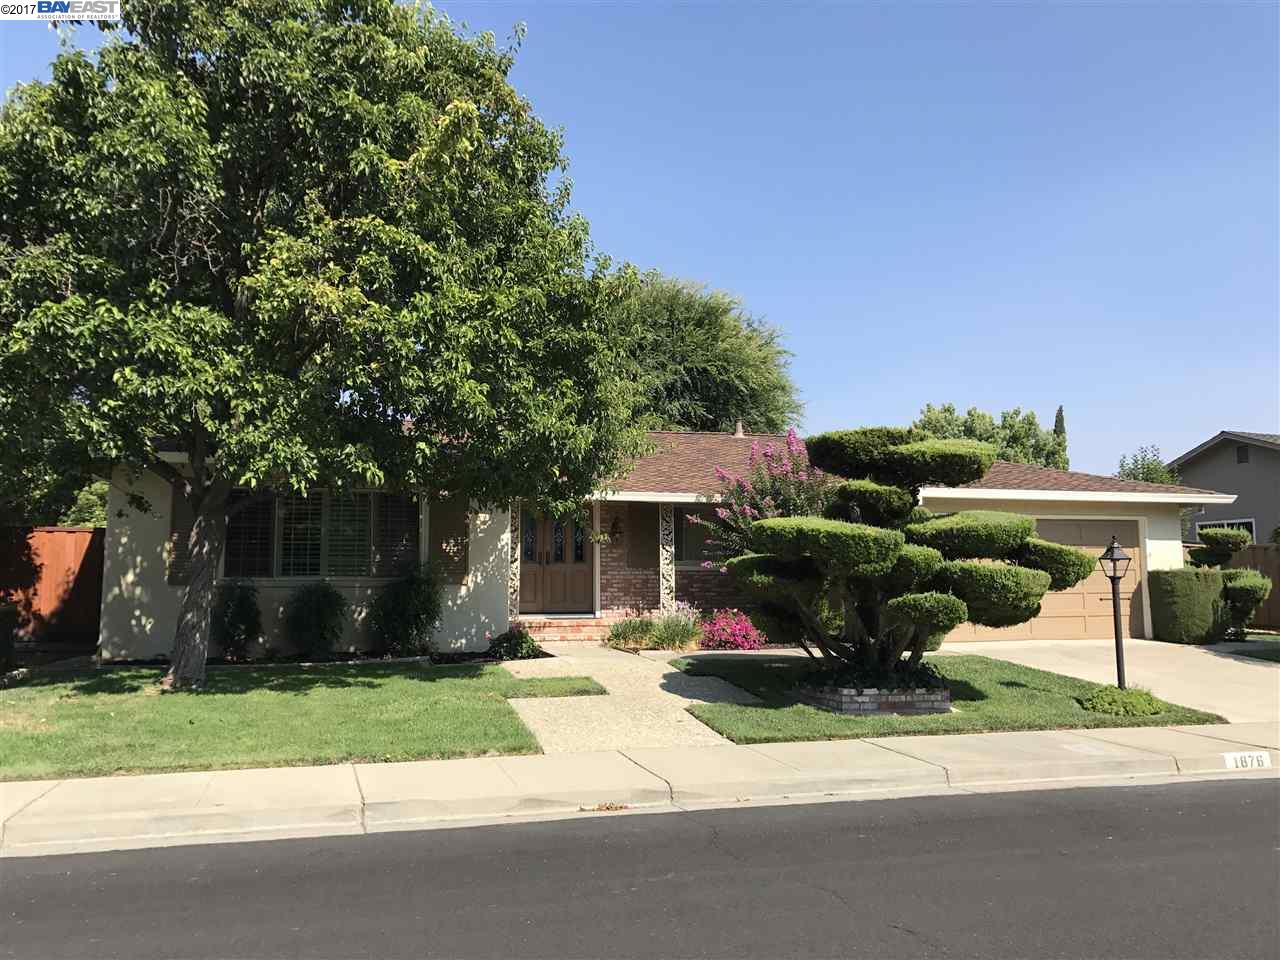 獨棟家庭住宅 為 出租 在 1876 Tanglewood Way 1876 Tanglewood Way Pleasanton, 加利福尼亞州 94566 美國